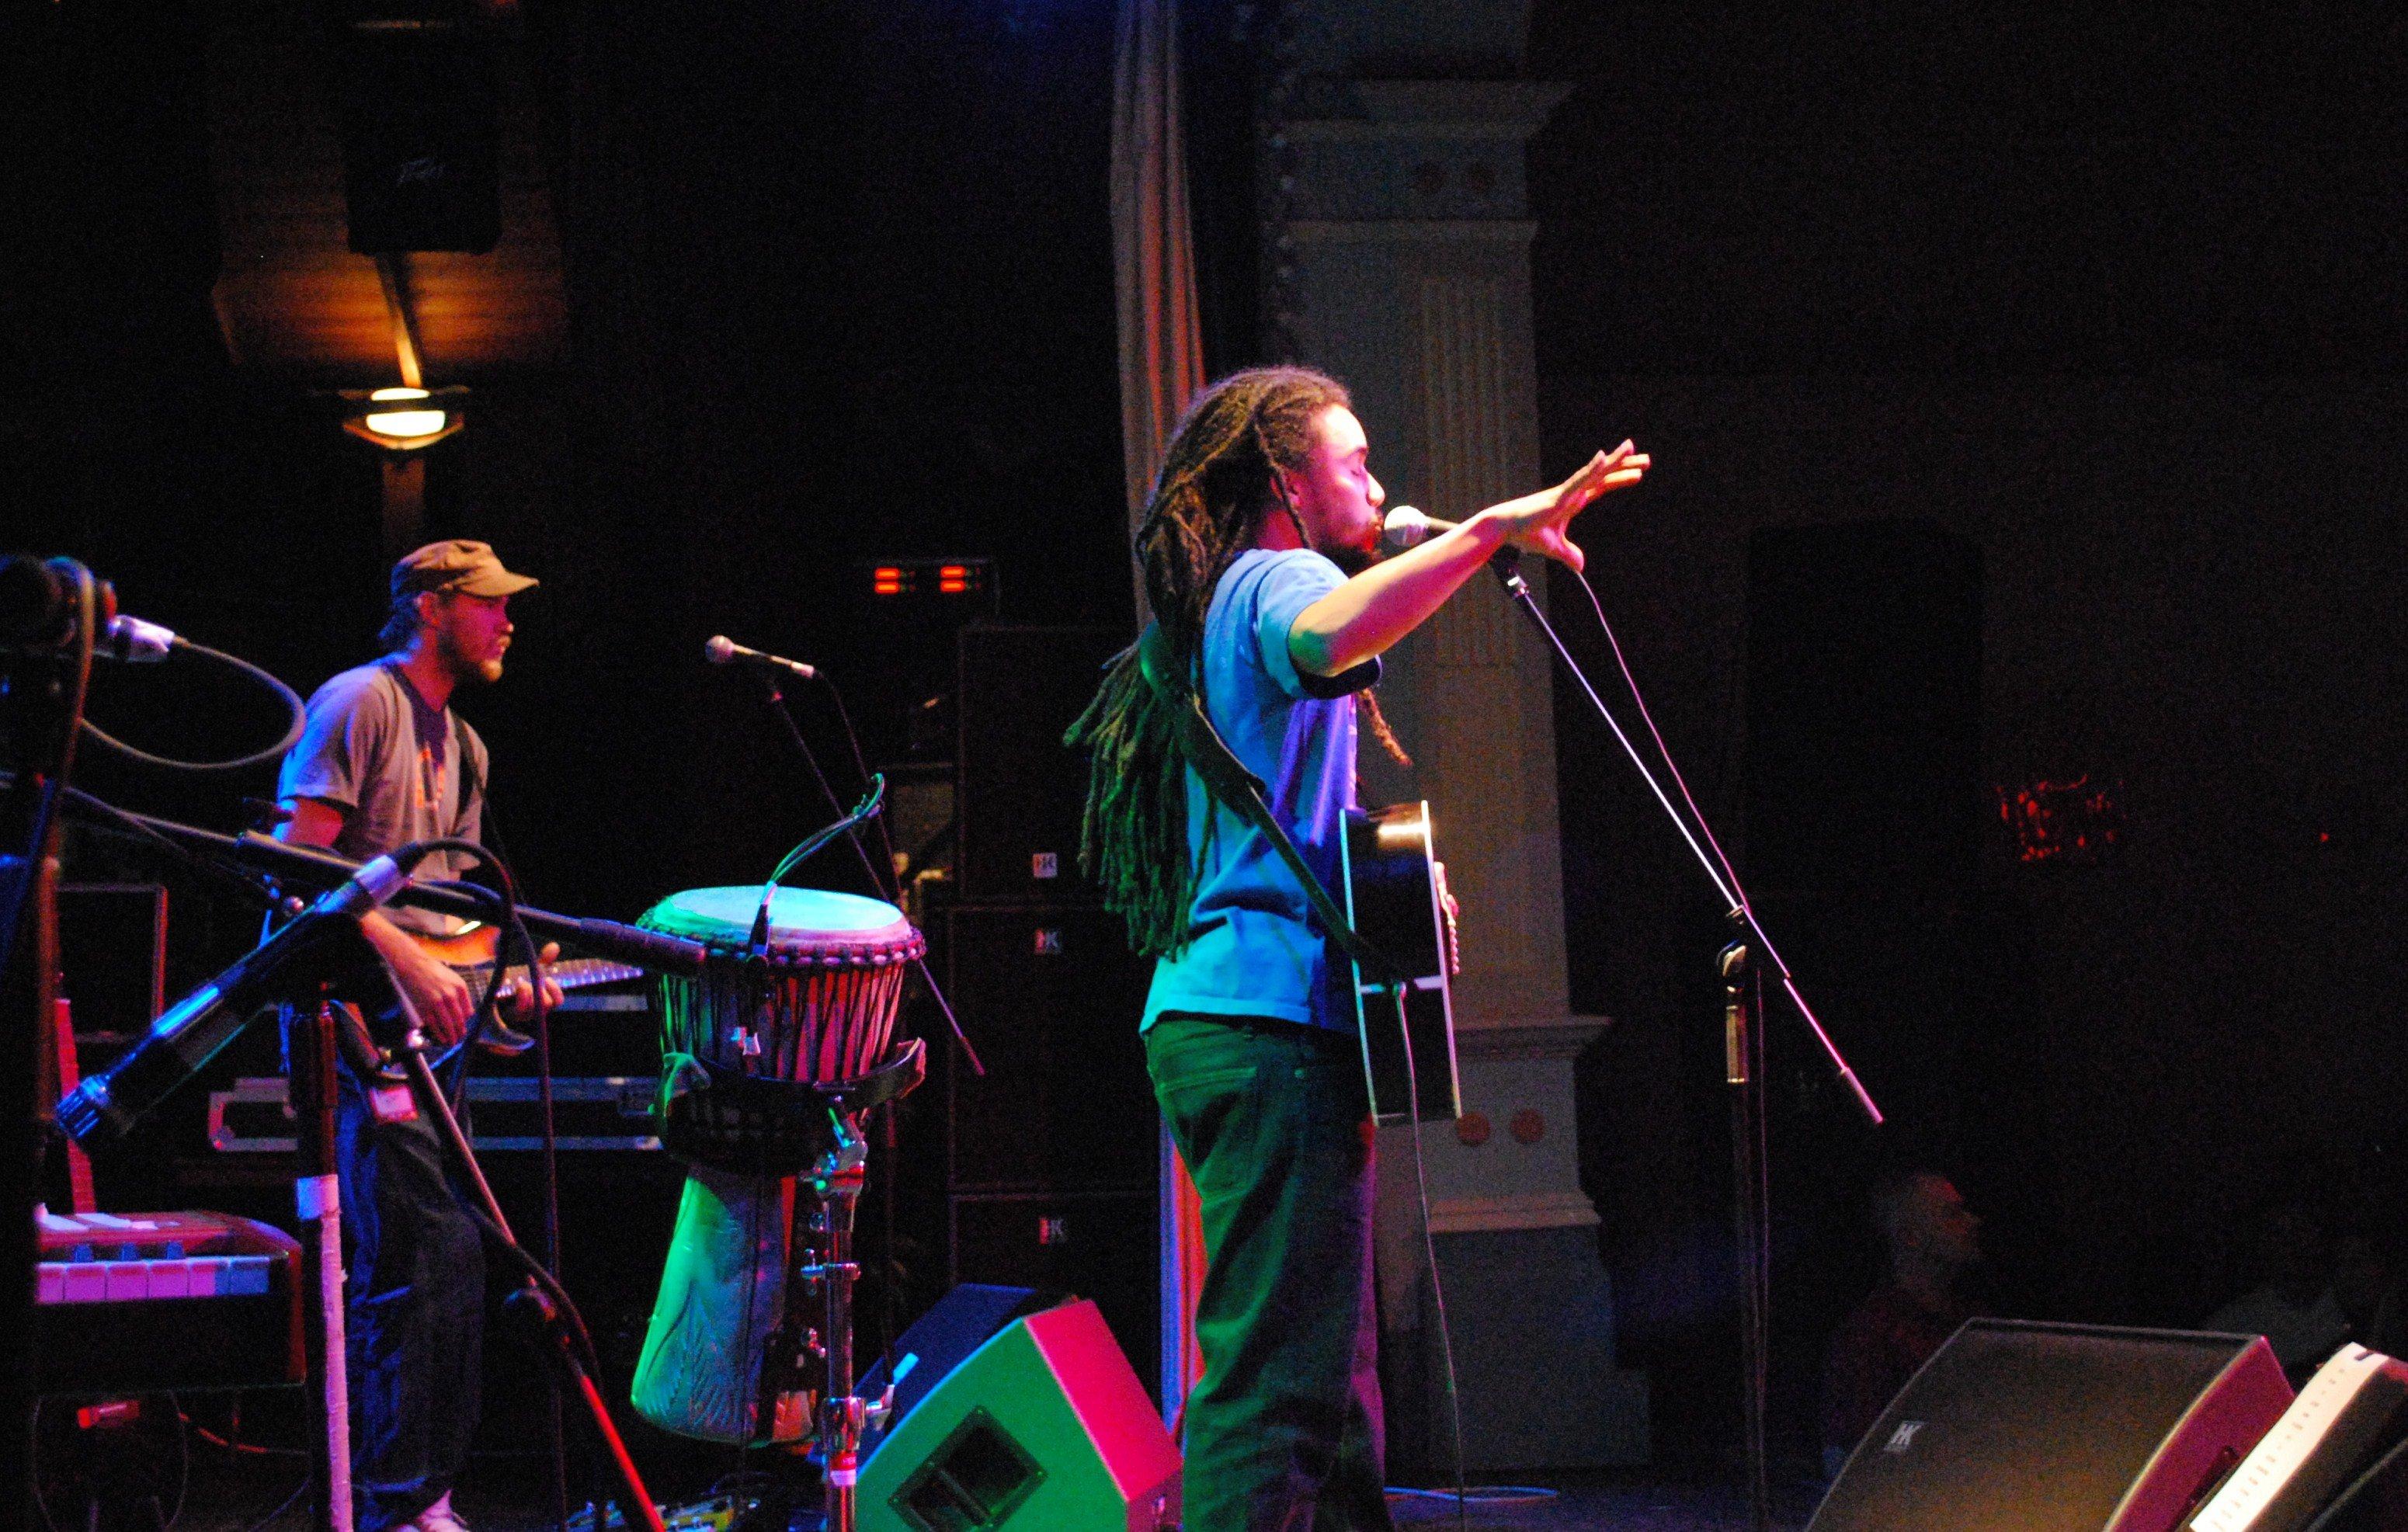 natty - revolution lyrics | metrolyrics